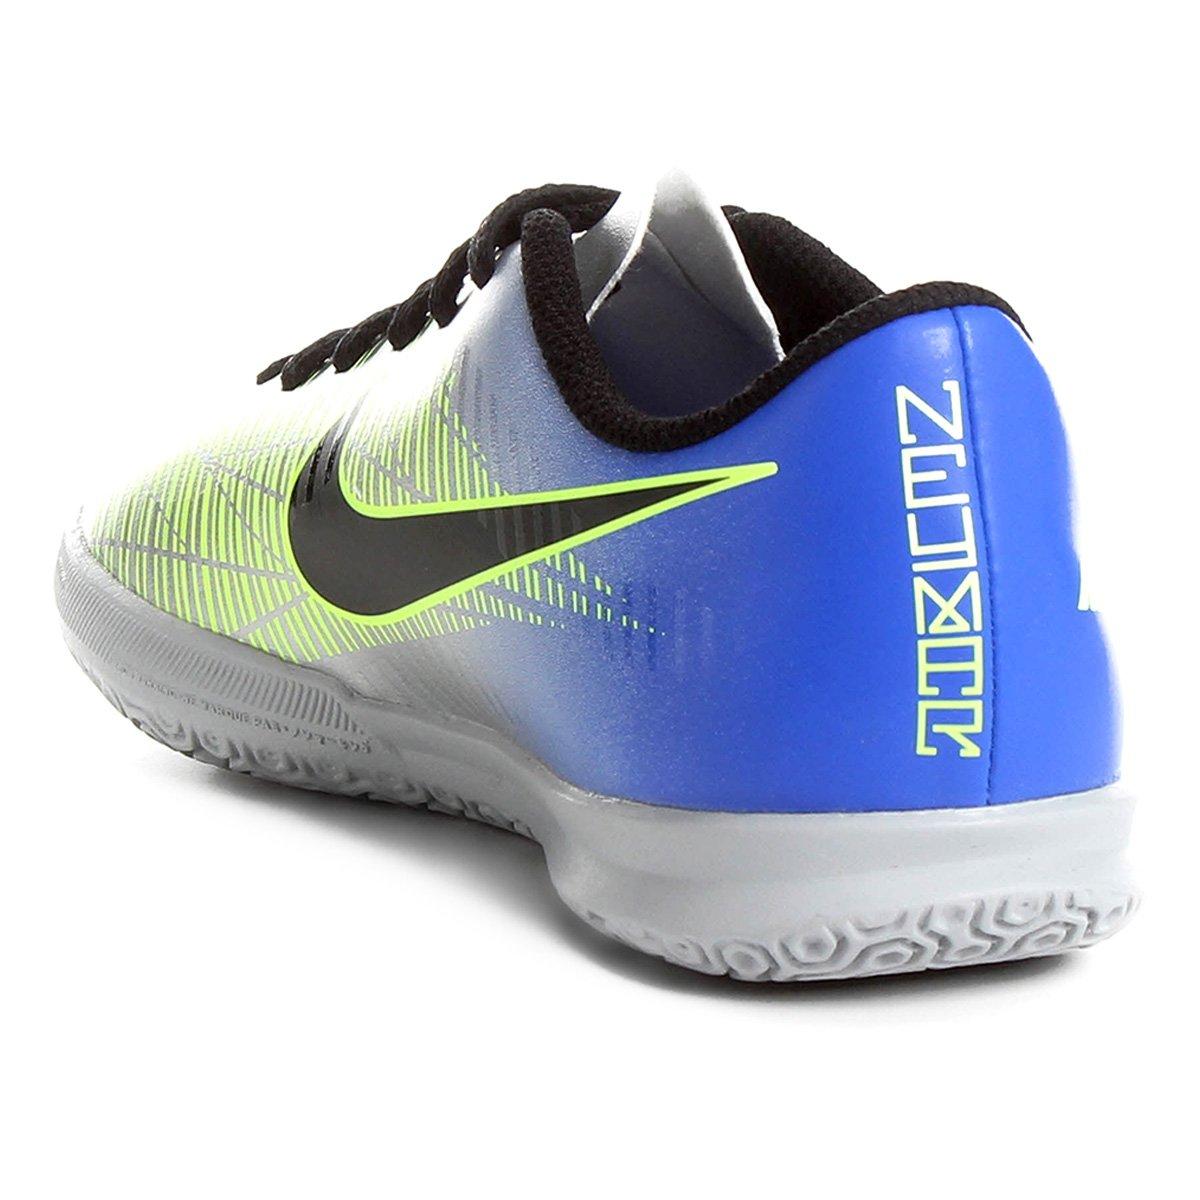 ... Chuteira Futsal Infantil Nike Mercurial Vortex 3 Neymar Jr IC ... 15501de52bd61